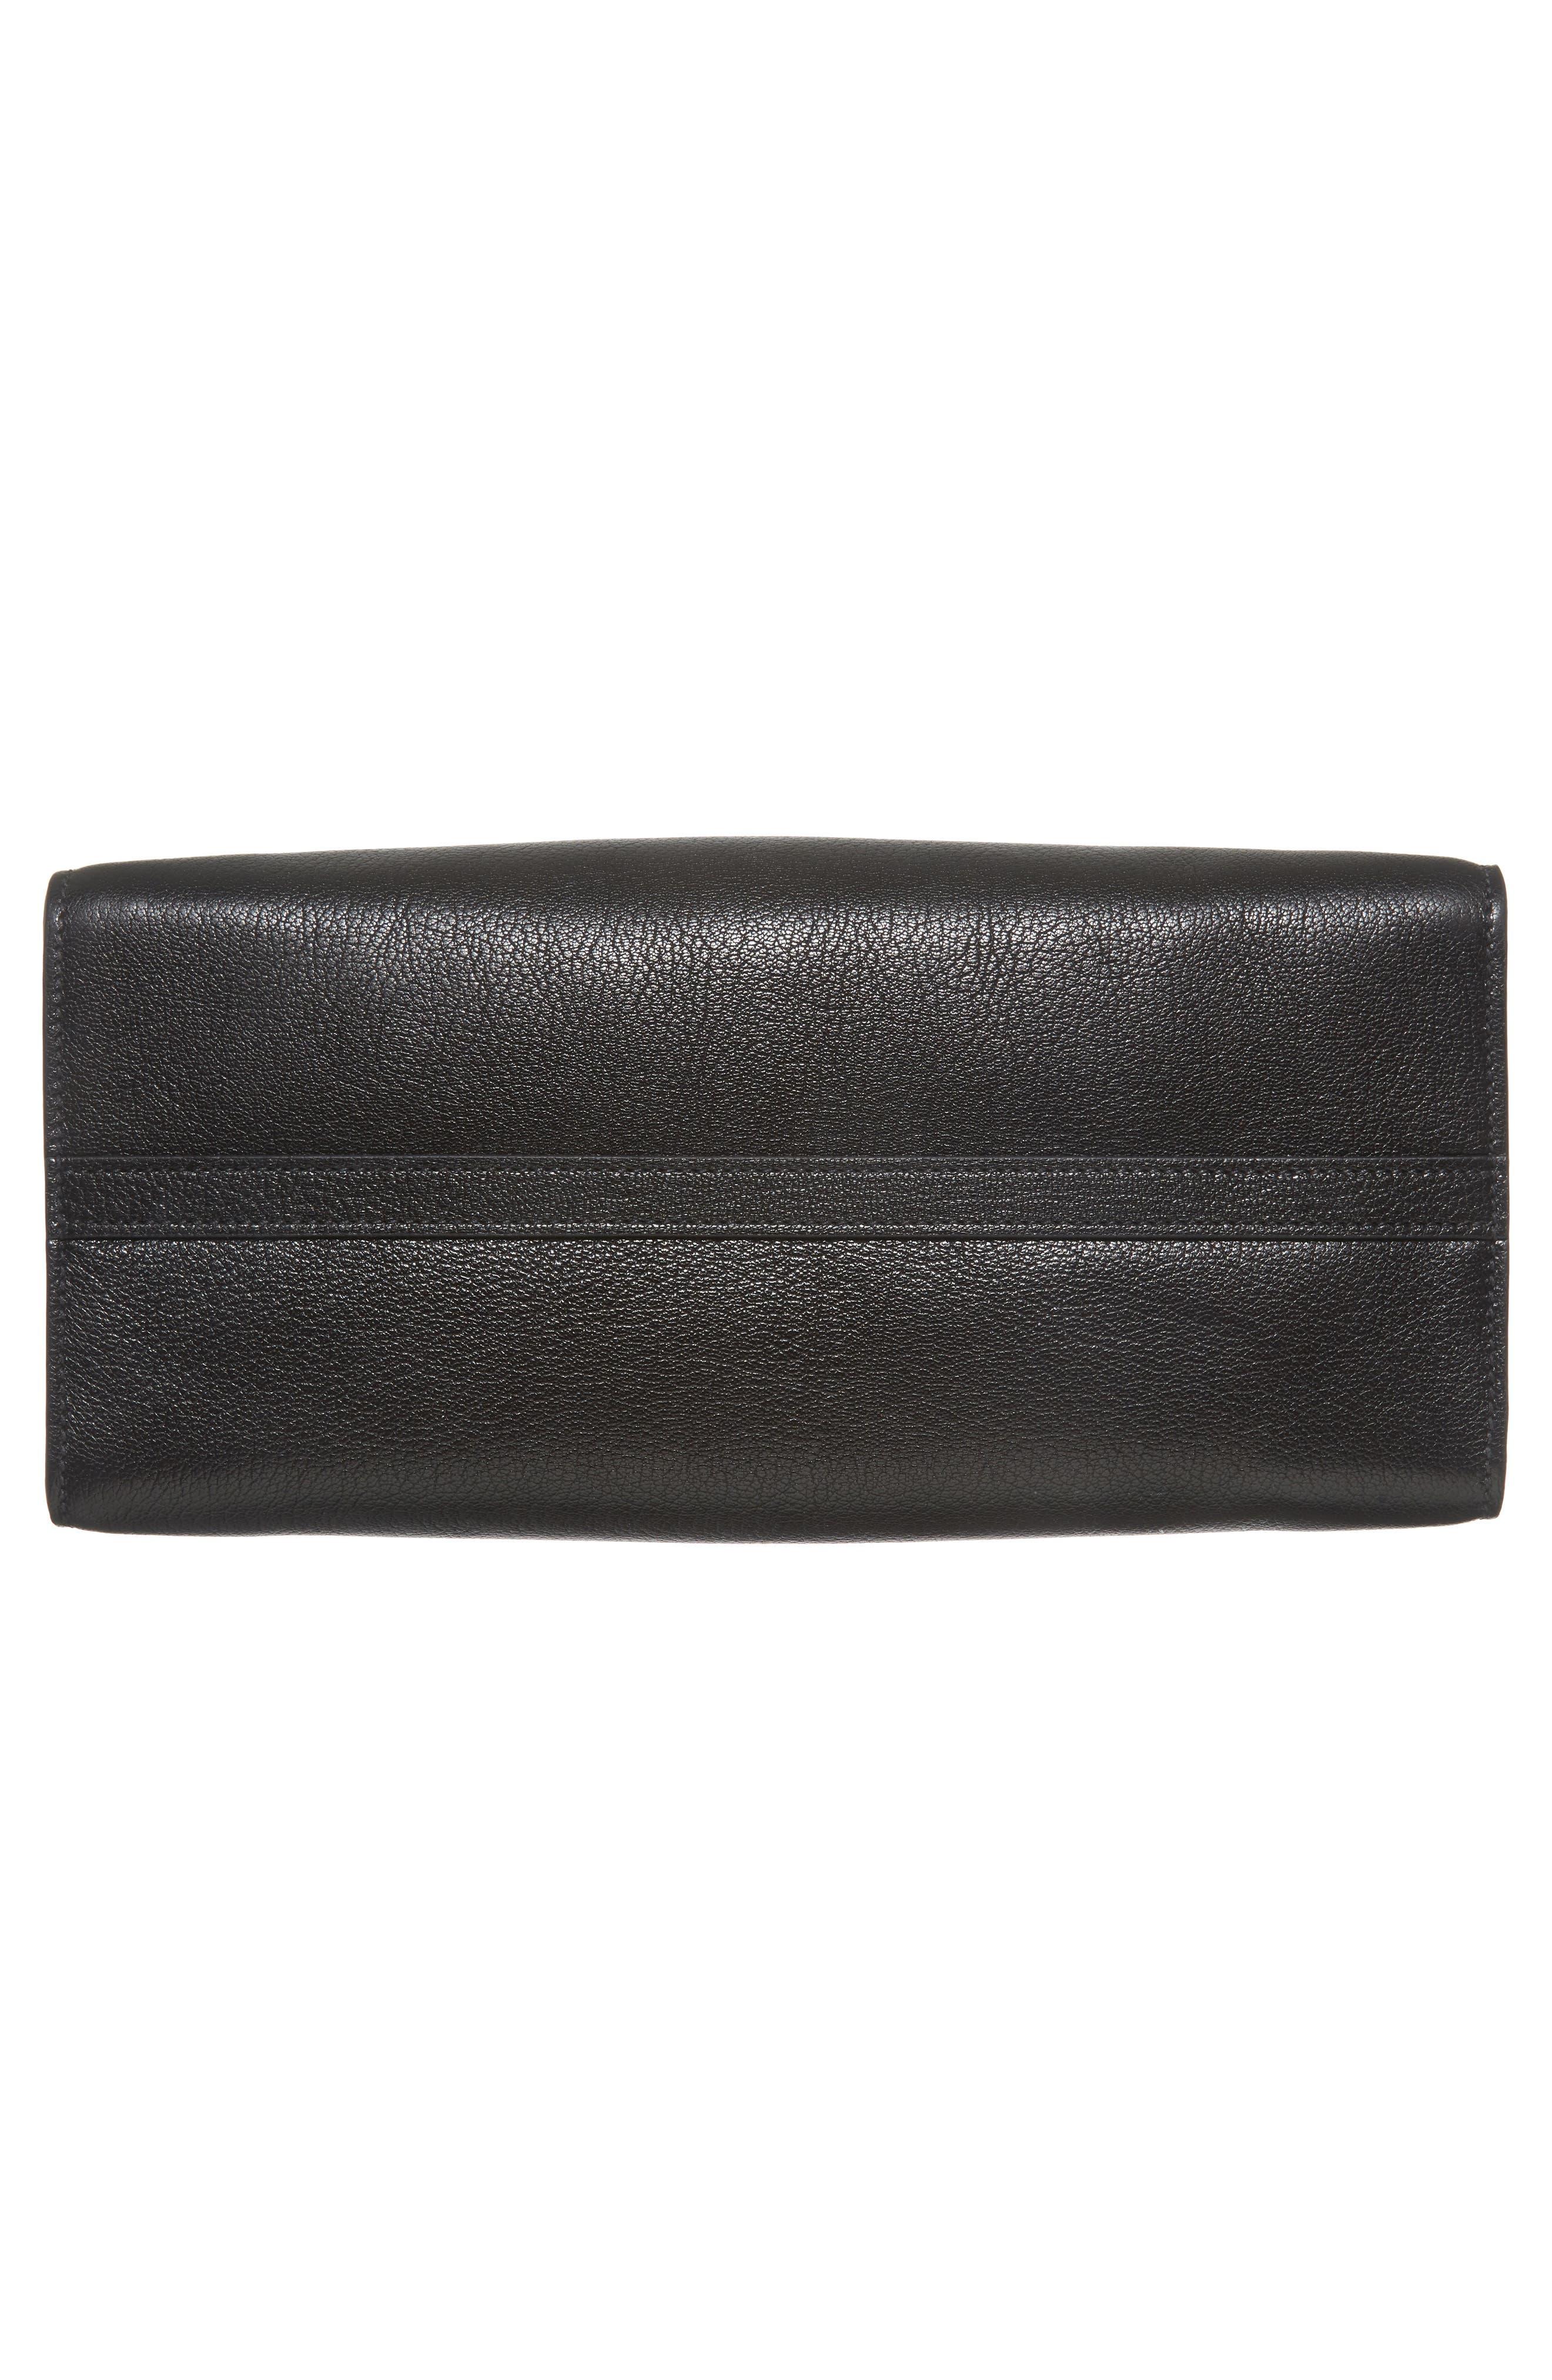 Leather Shopper,                             Alternate thumbnail 6, color,                             001